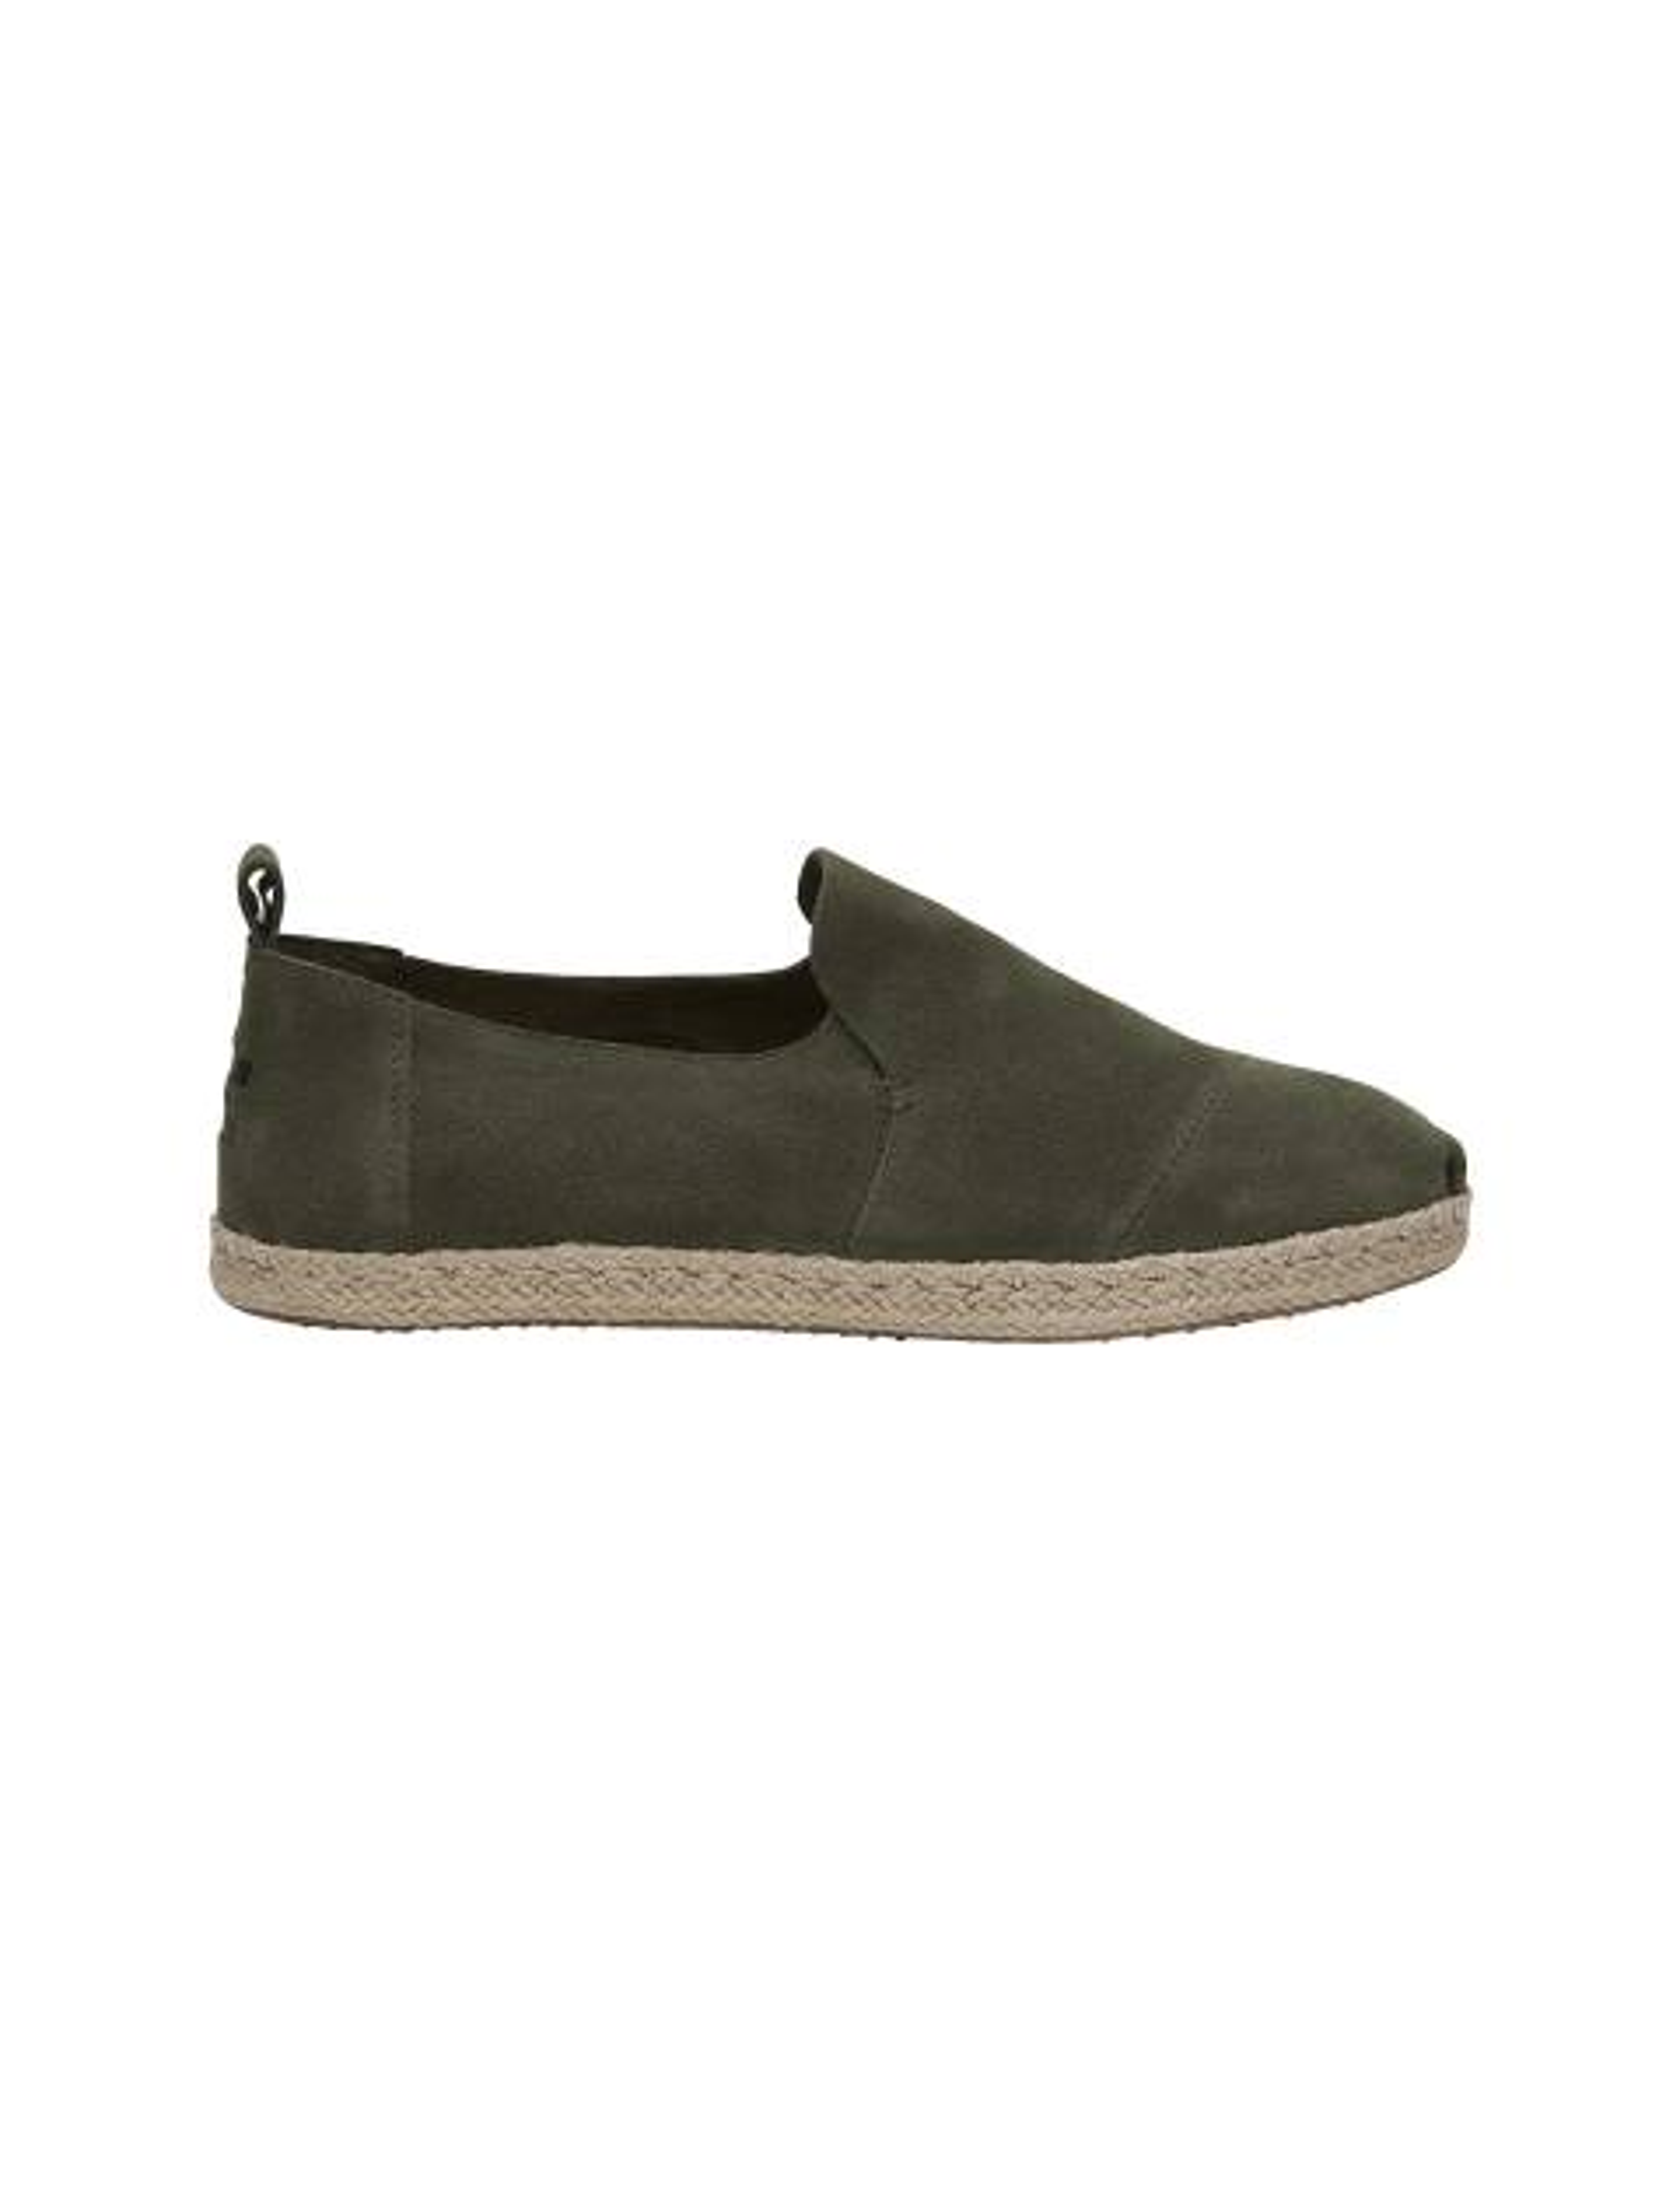 کفش راحتی جیر مردانه Deconstructed - زيتوني - 1